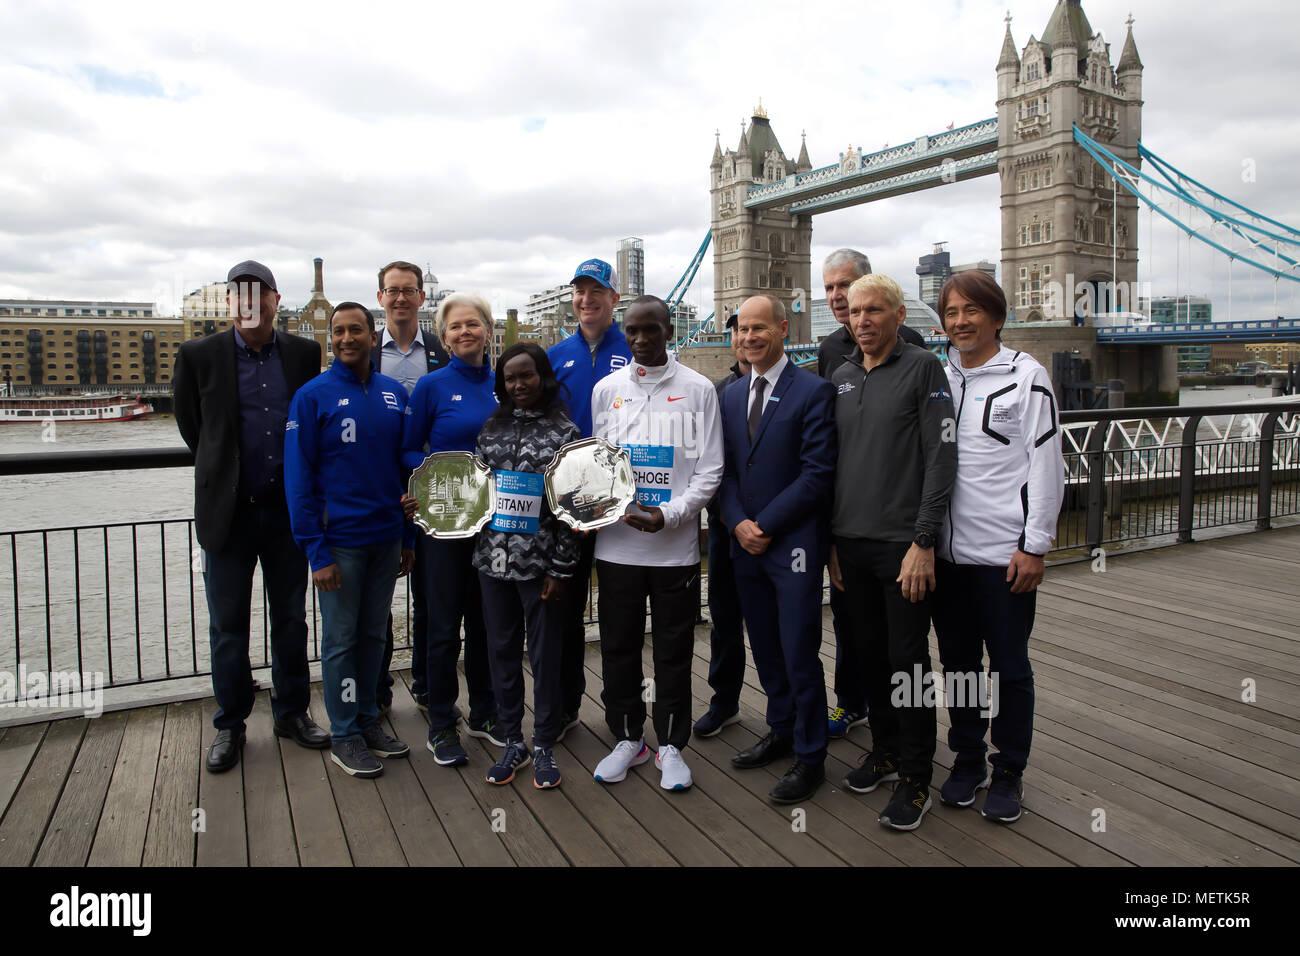 London,UK,23rd April 2018,Abbott World Marathon Majors photocall by Tower Bridge.Credit Keith Larby/Alamy Live News - Stock Image